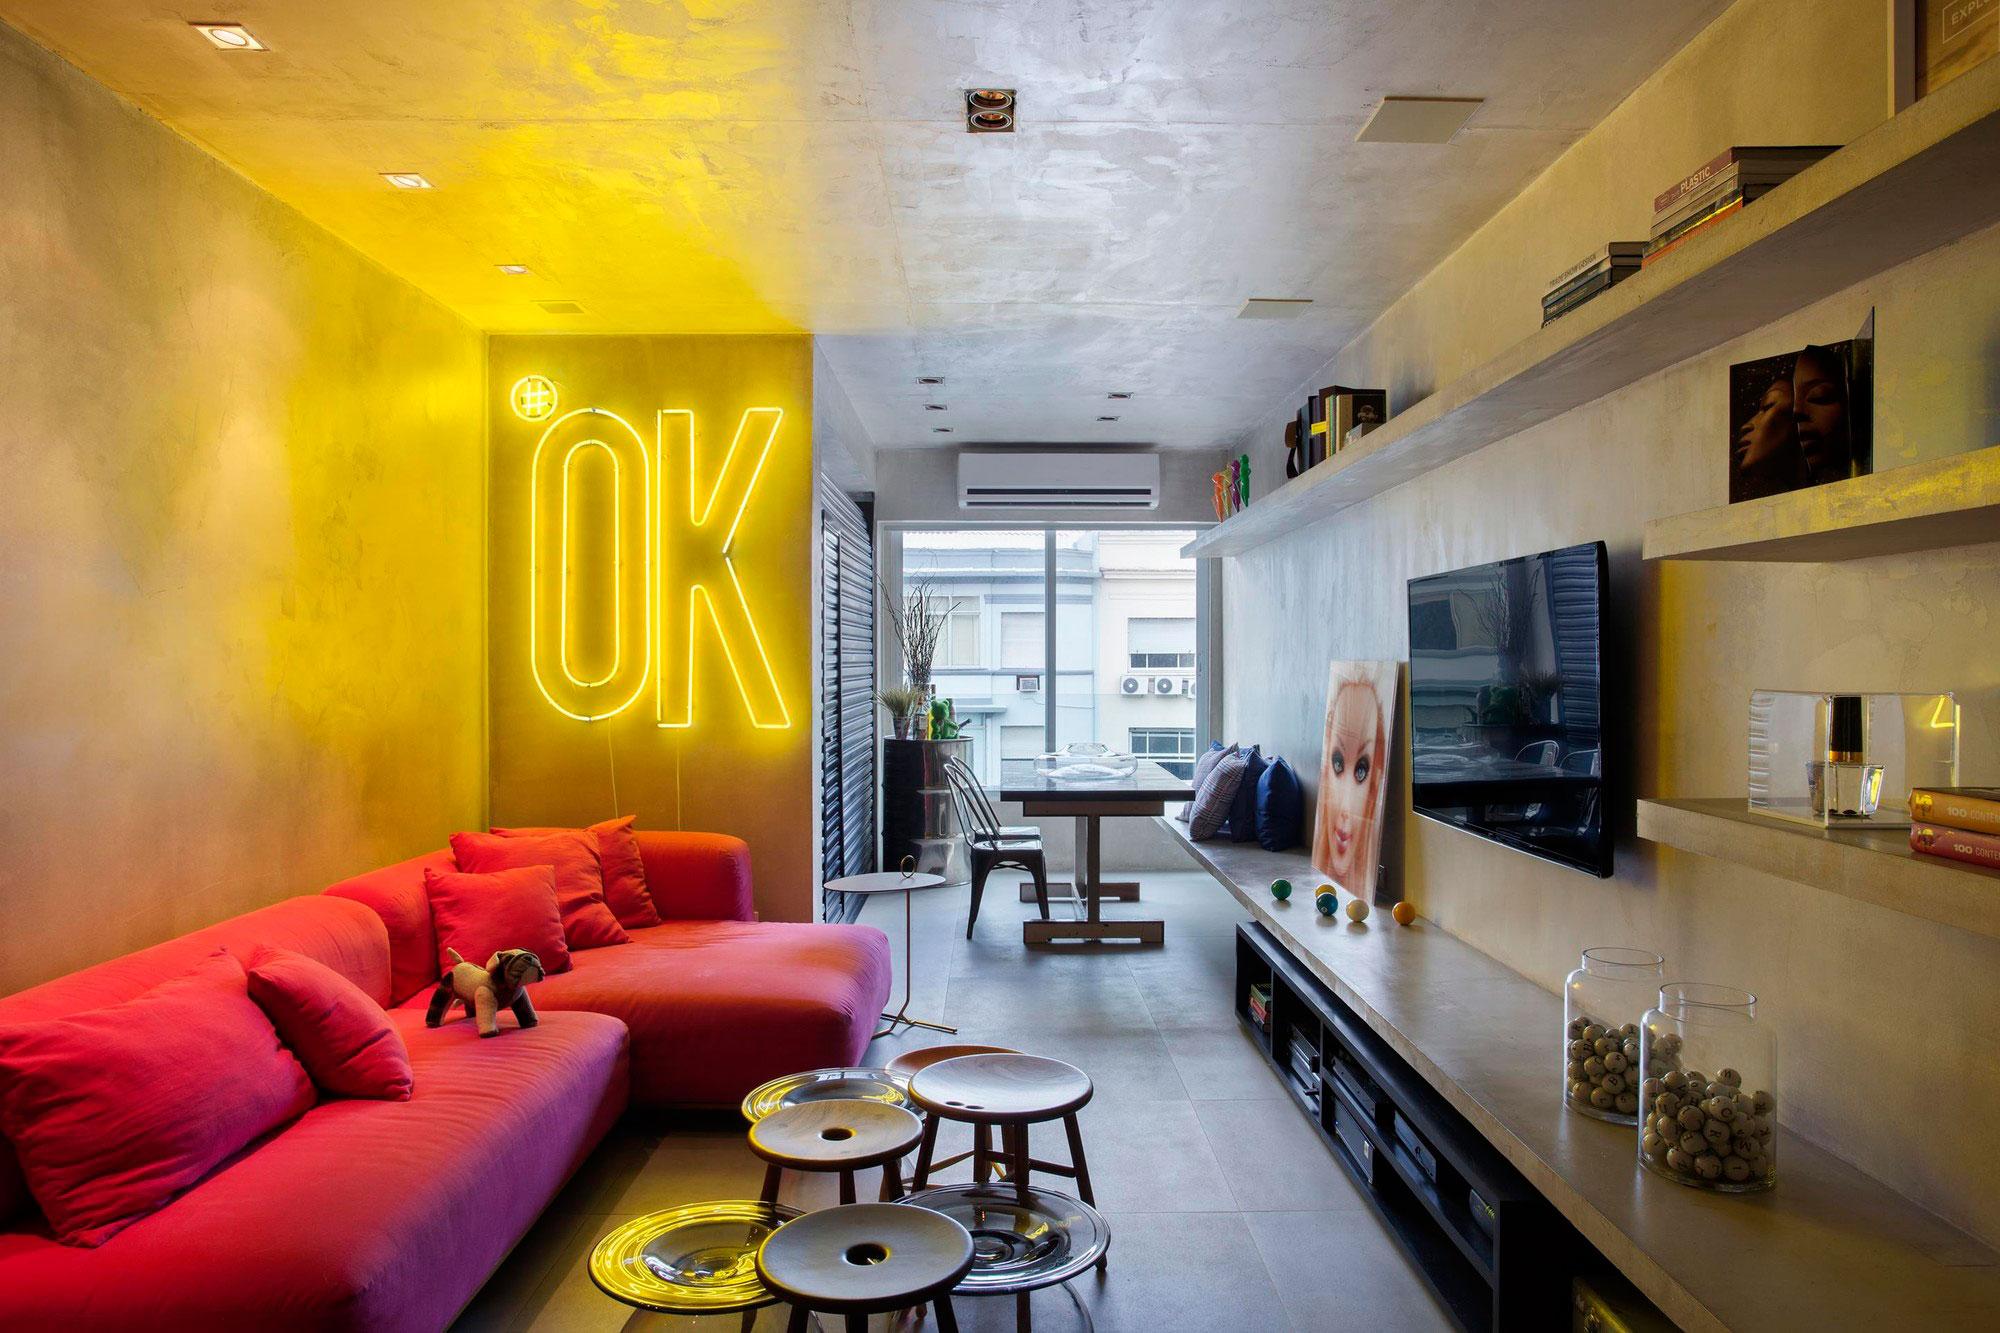 Sala Para Dois Ambientes 60 Projetos Integrados Fotos  -> Estante Gesso Sala Tv